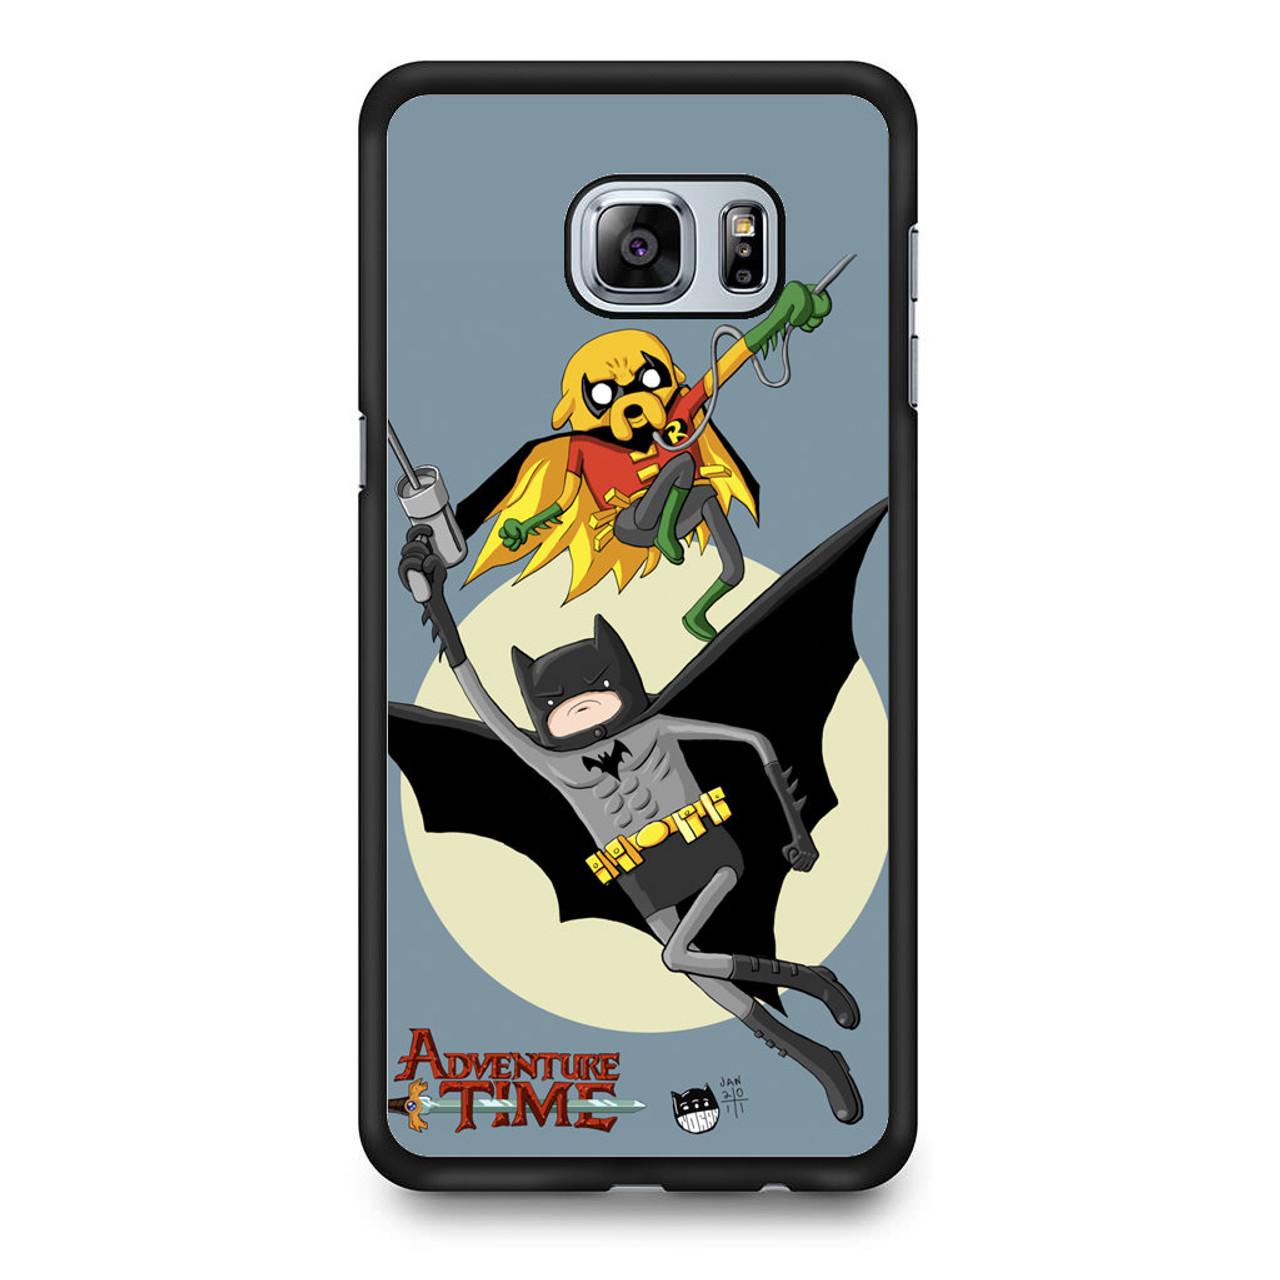 promo code 3030d 43c1c Adventure Time Batman and Robbin Samsung Galaxy S6 Edge Plus Case